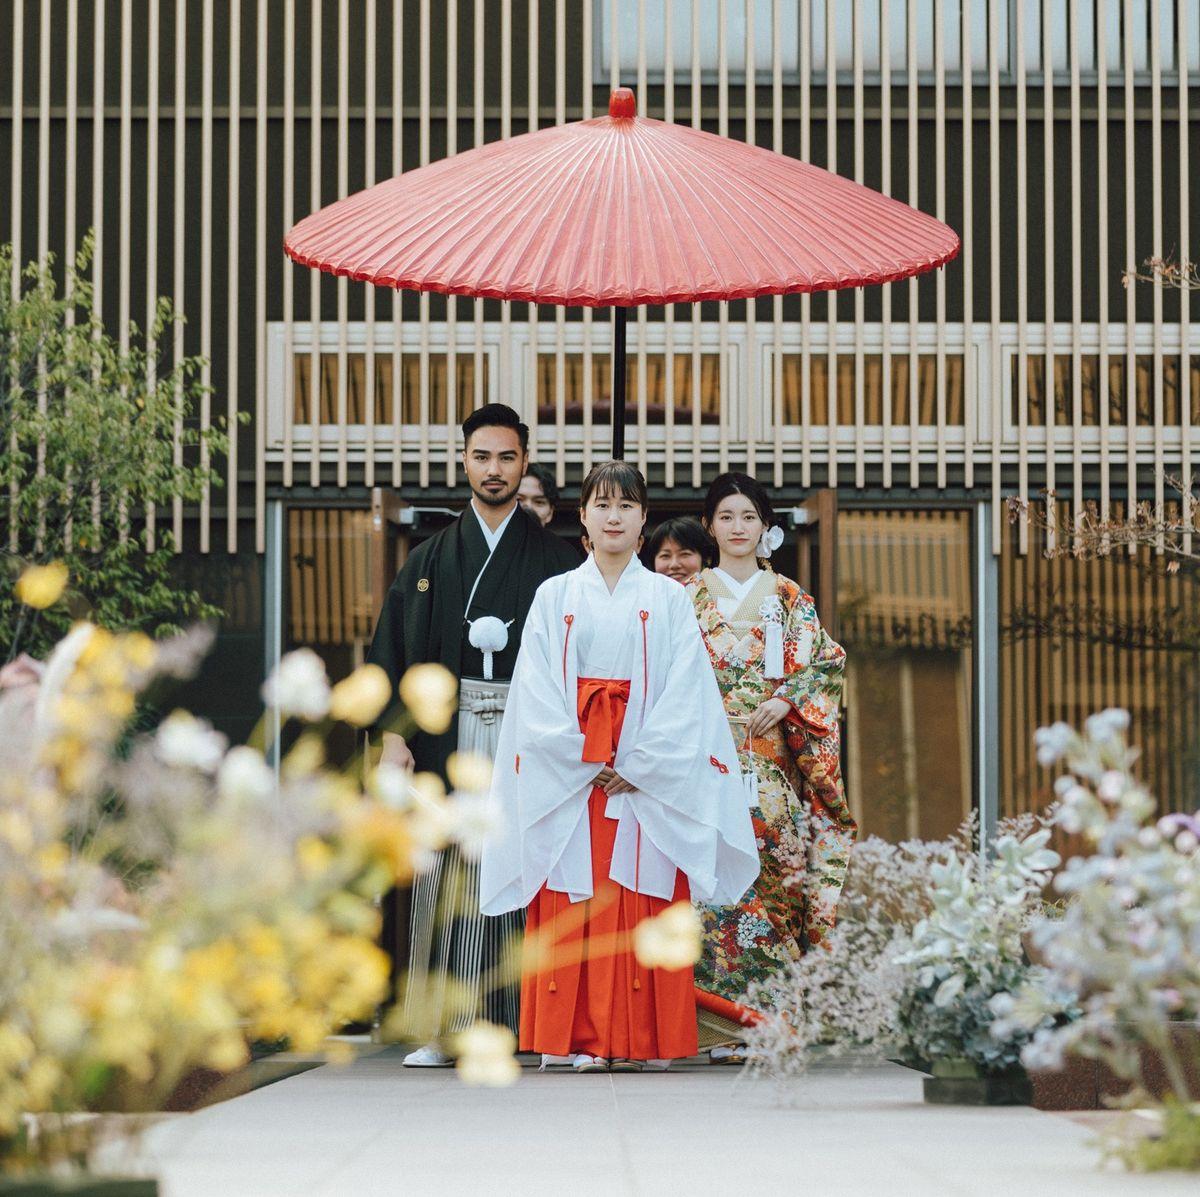 BISHO EN -美翔苑-の公式写真1枚目